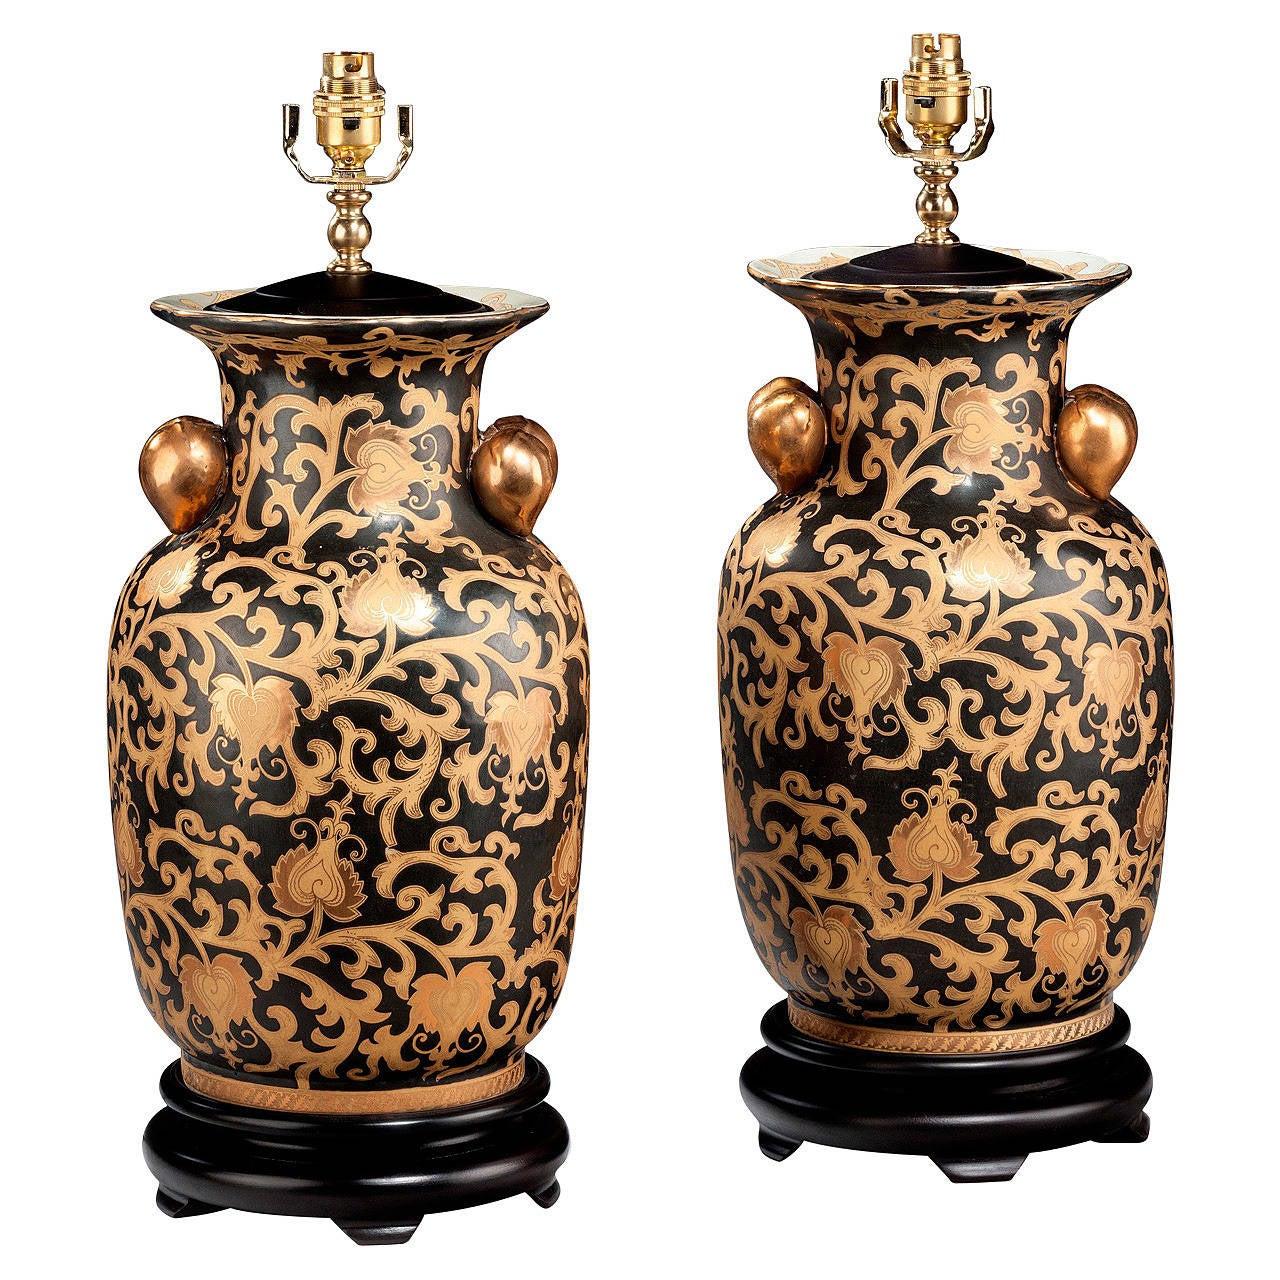 Pair of 20th century Decorative Lamps